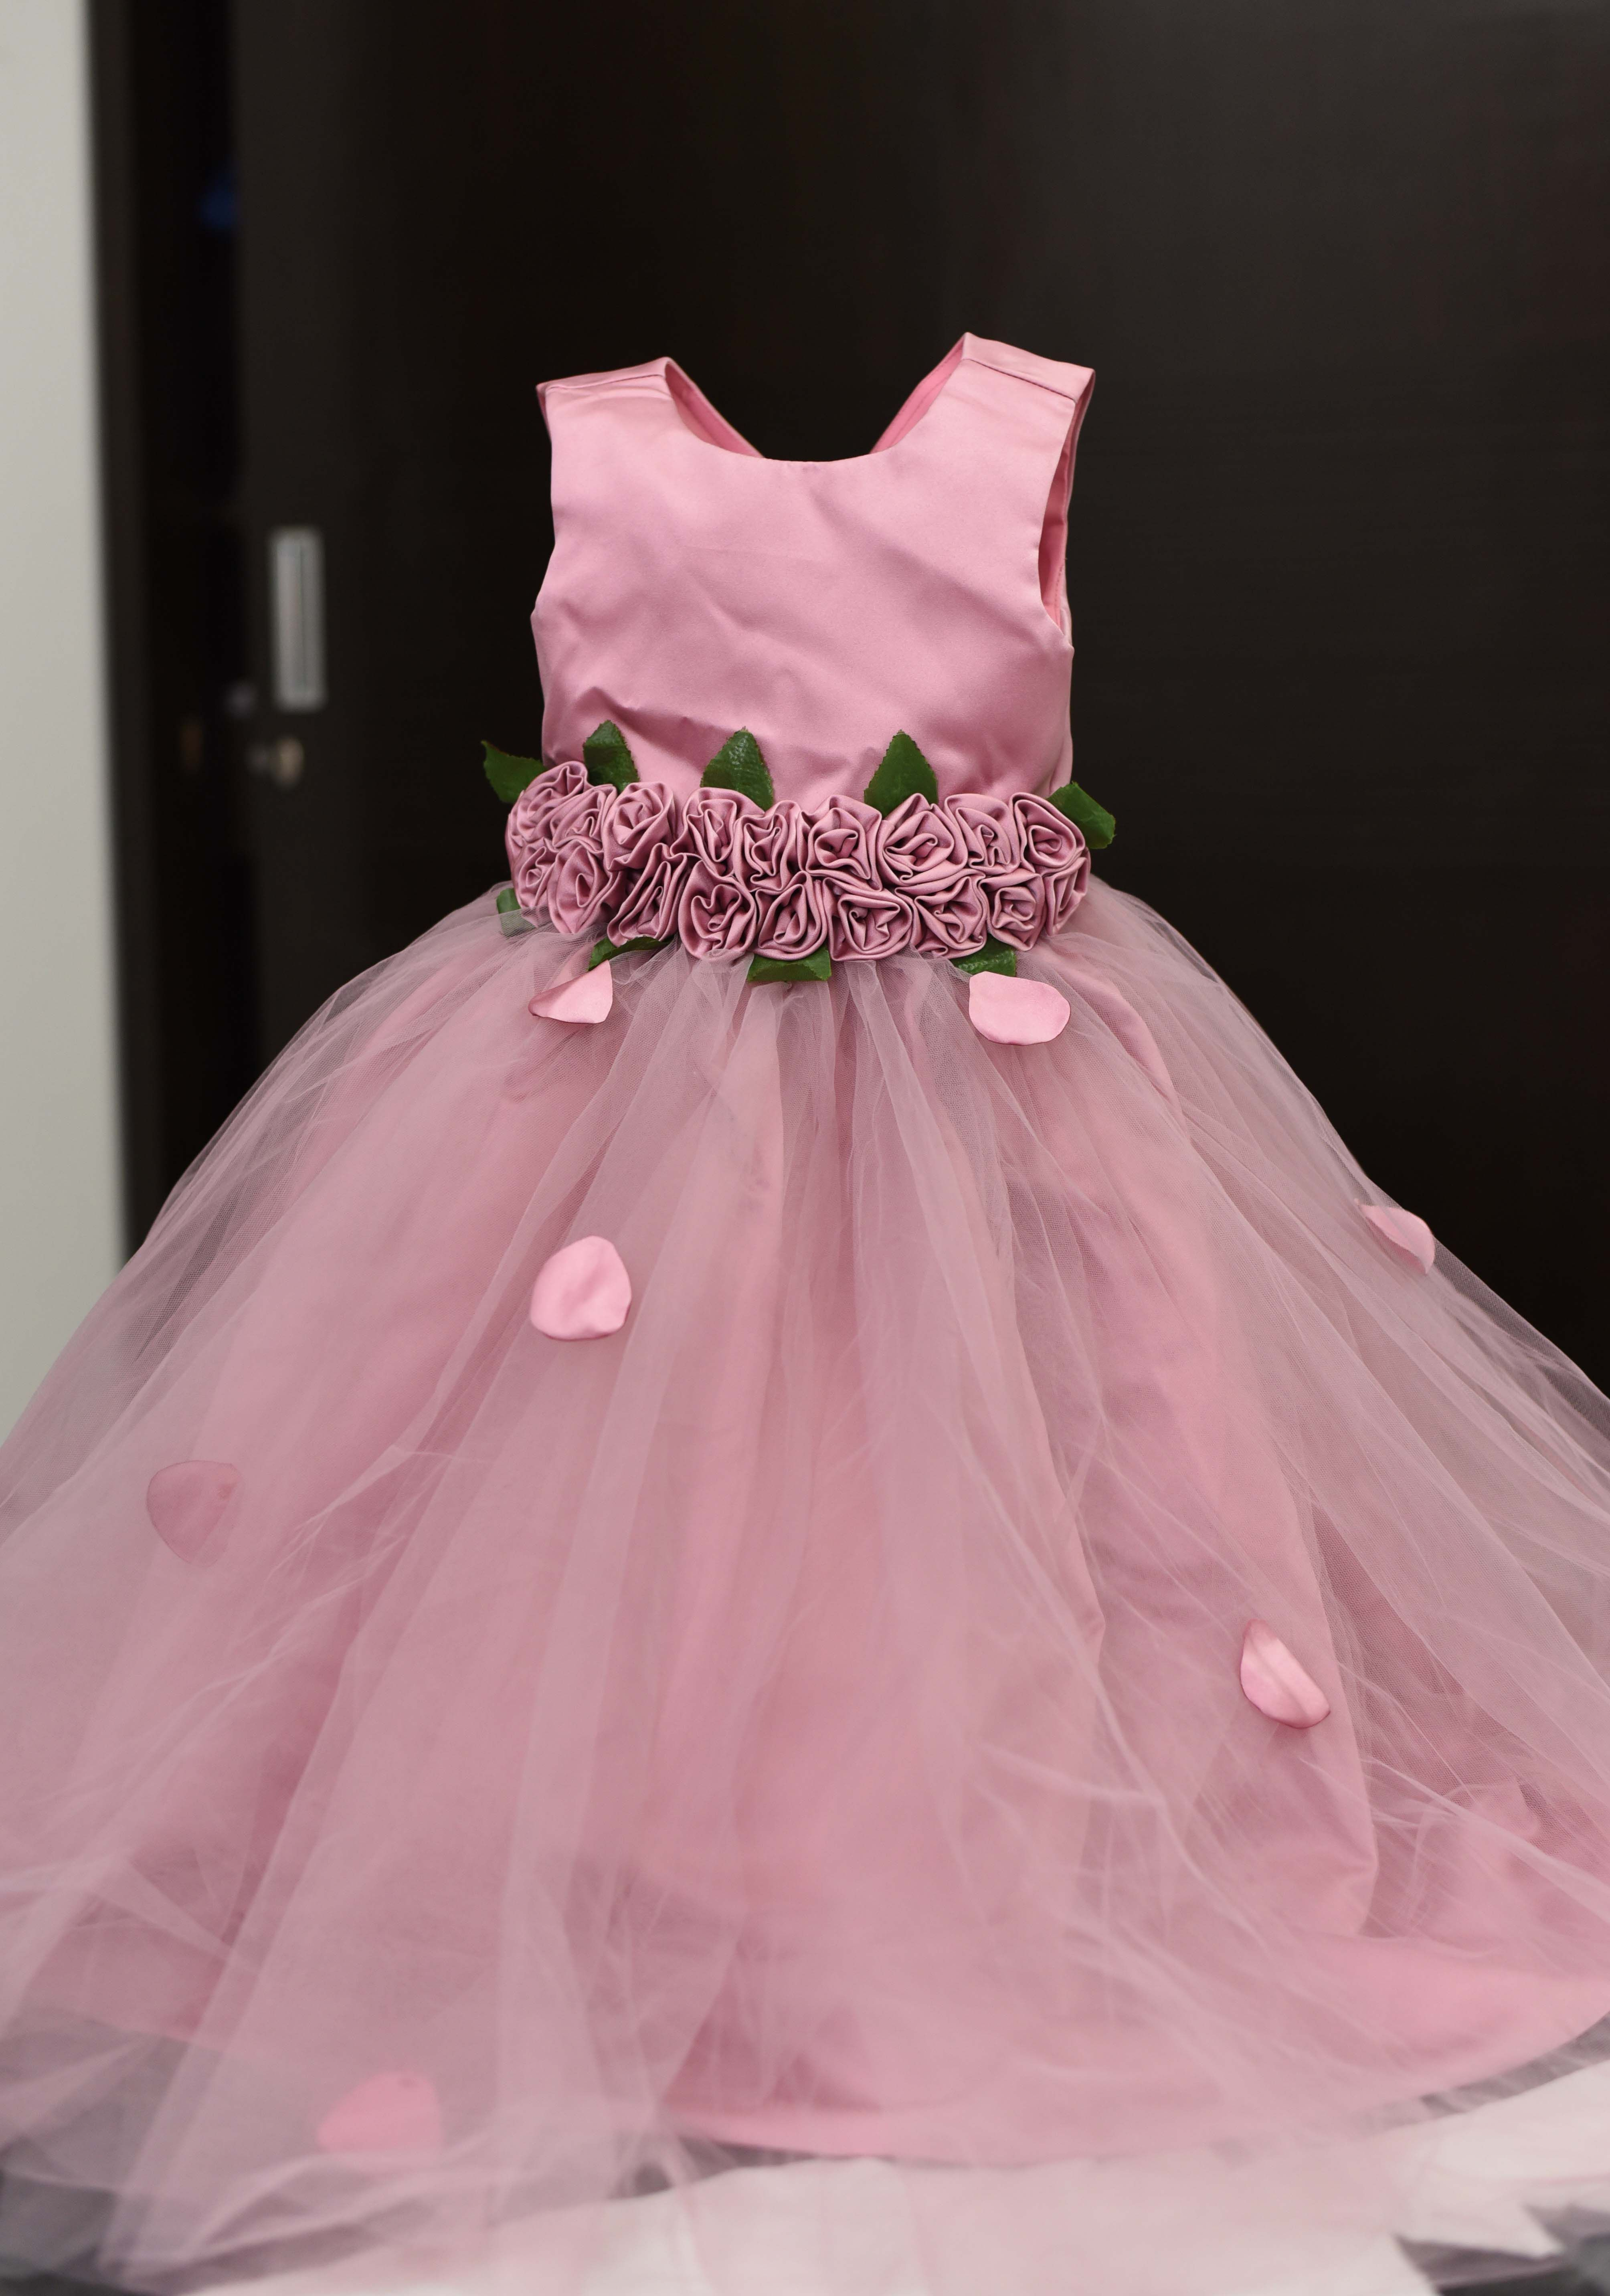 Compre Por Encargo Hermosos Vestidos De Niñas De Flores De Color ...